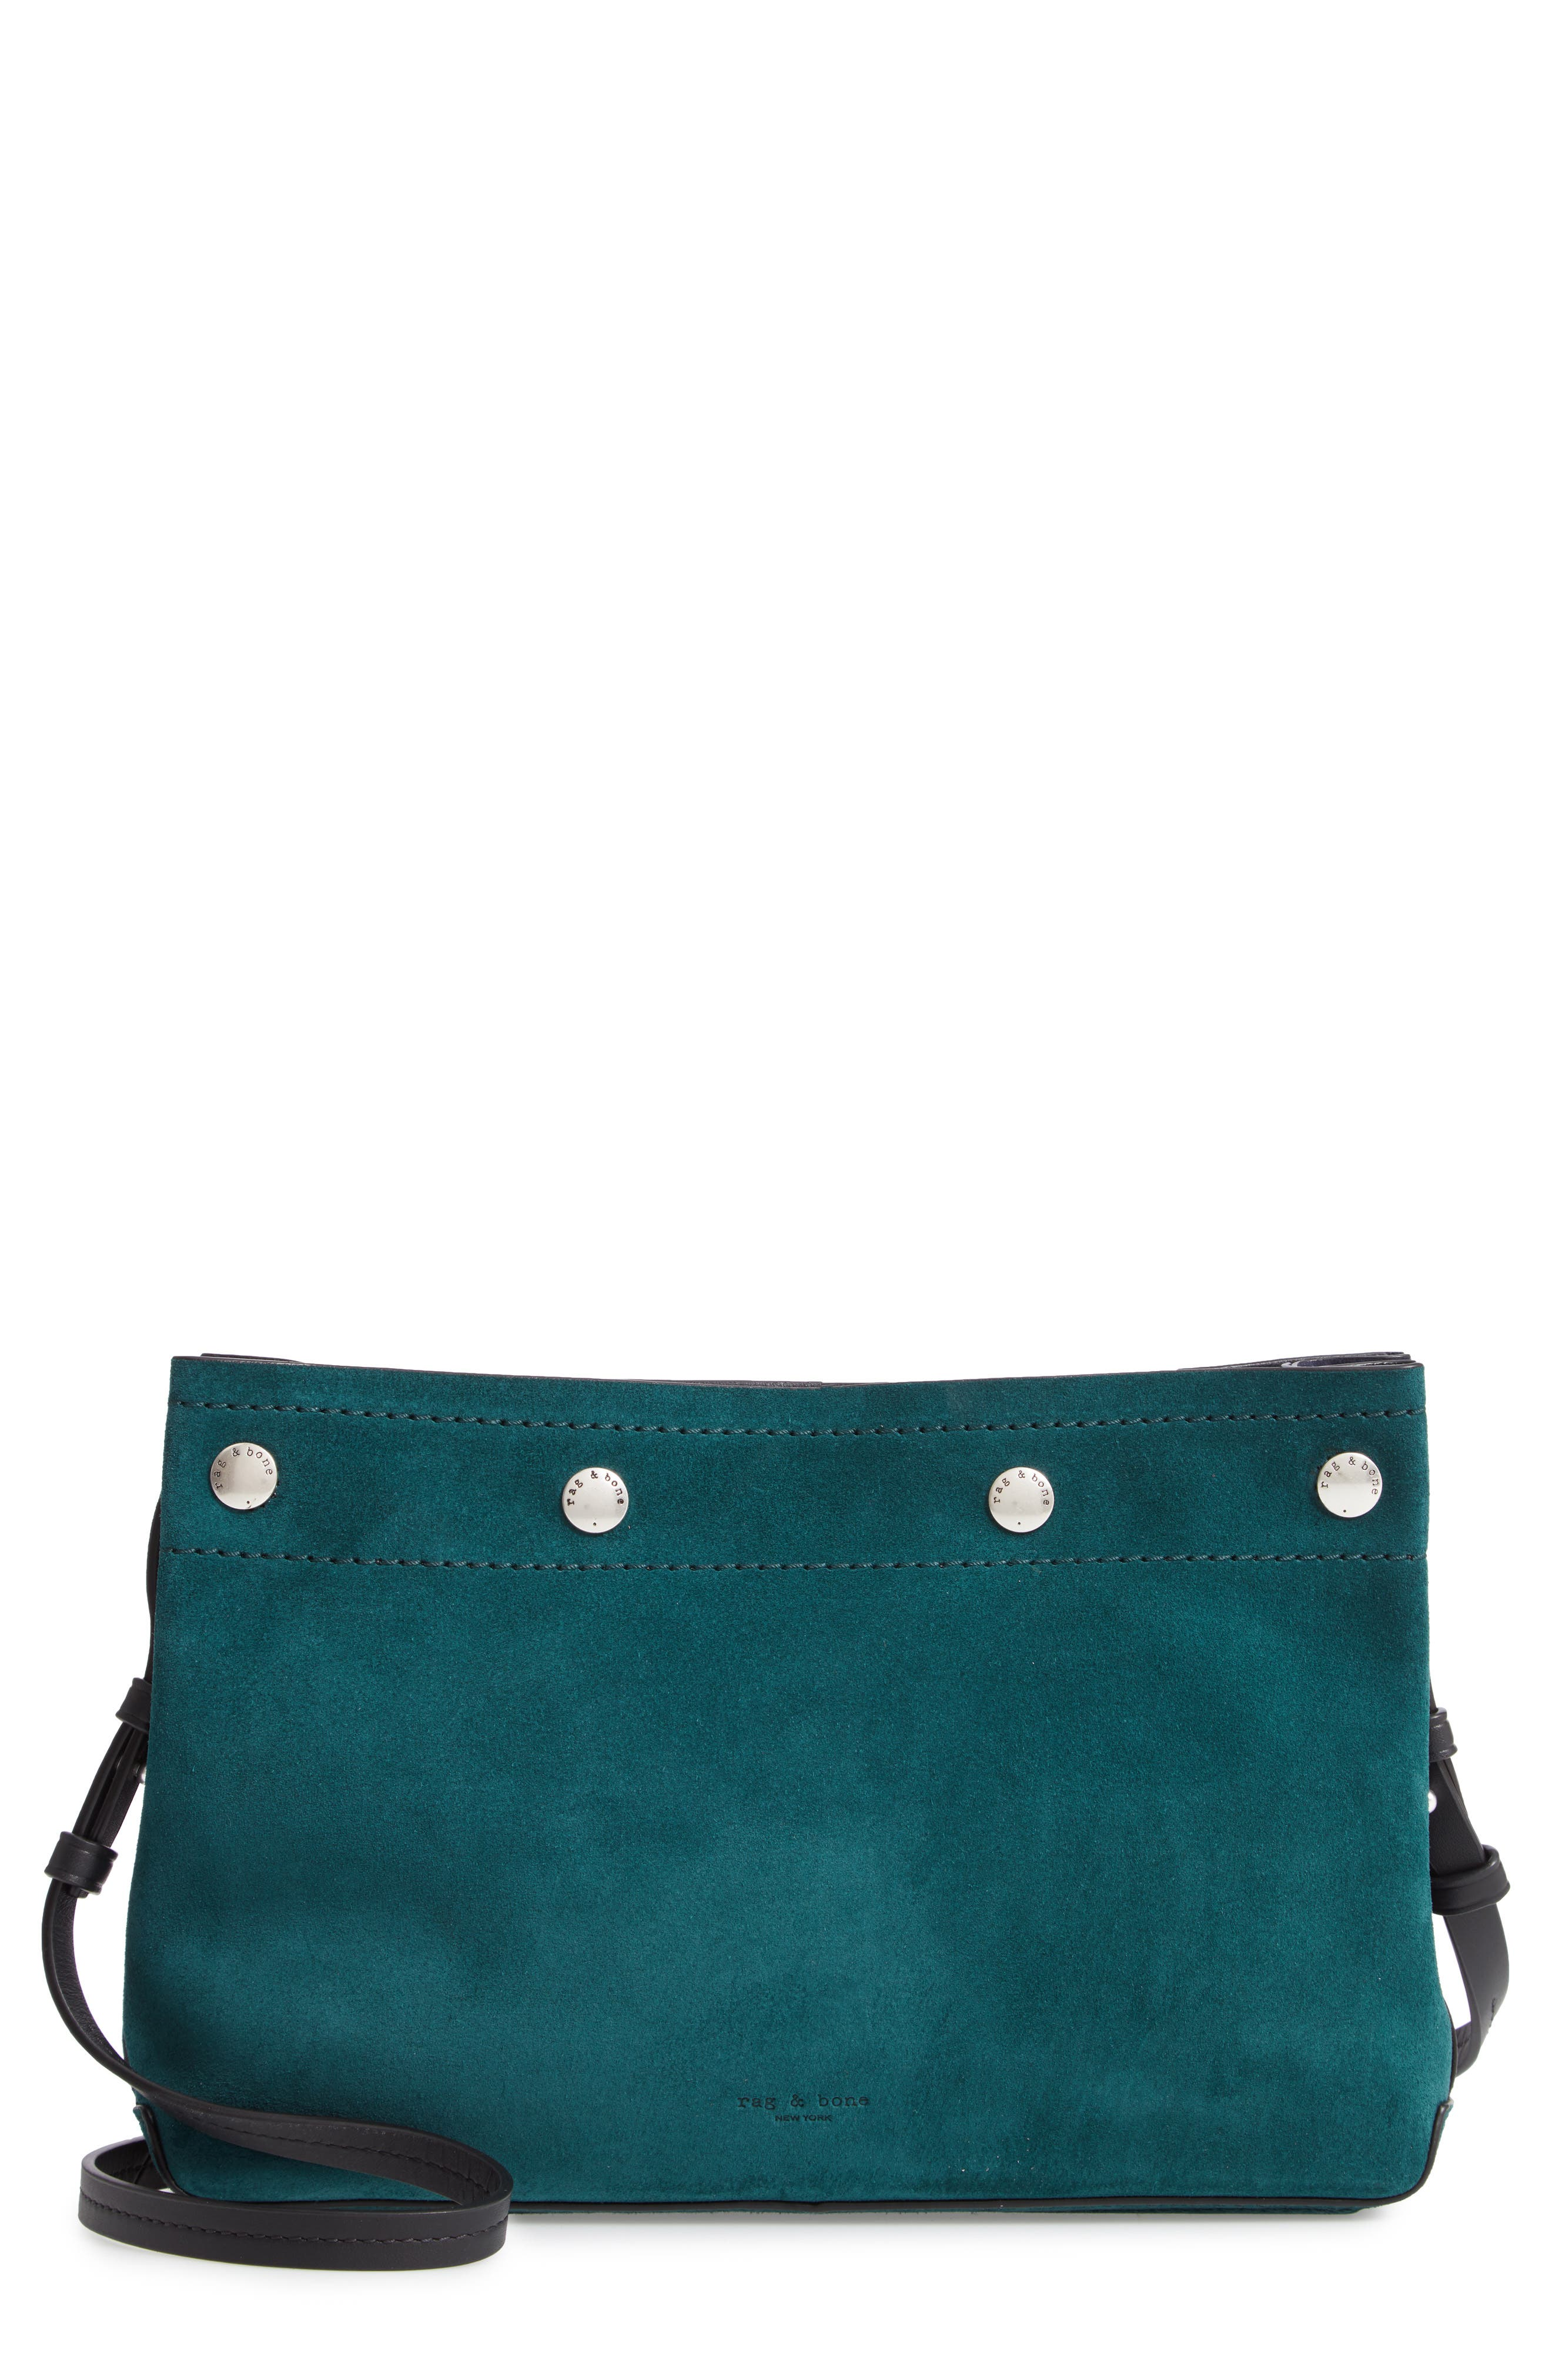 RAG & BONE,                             Compass Colorblock Leather Crossbody Bag,                             Main thumbnail 1, color,                             FOREST MULTI